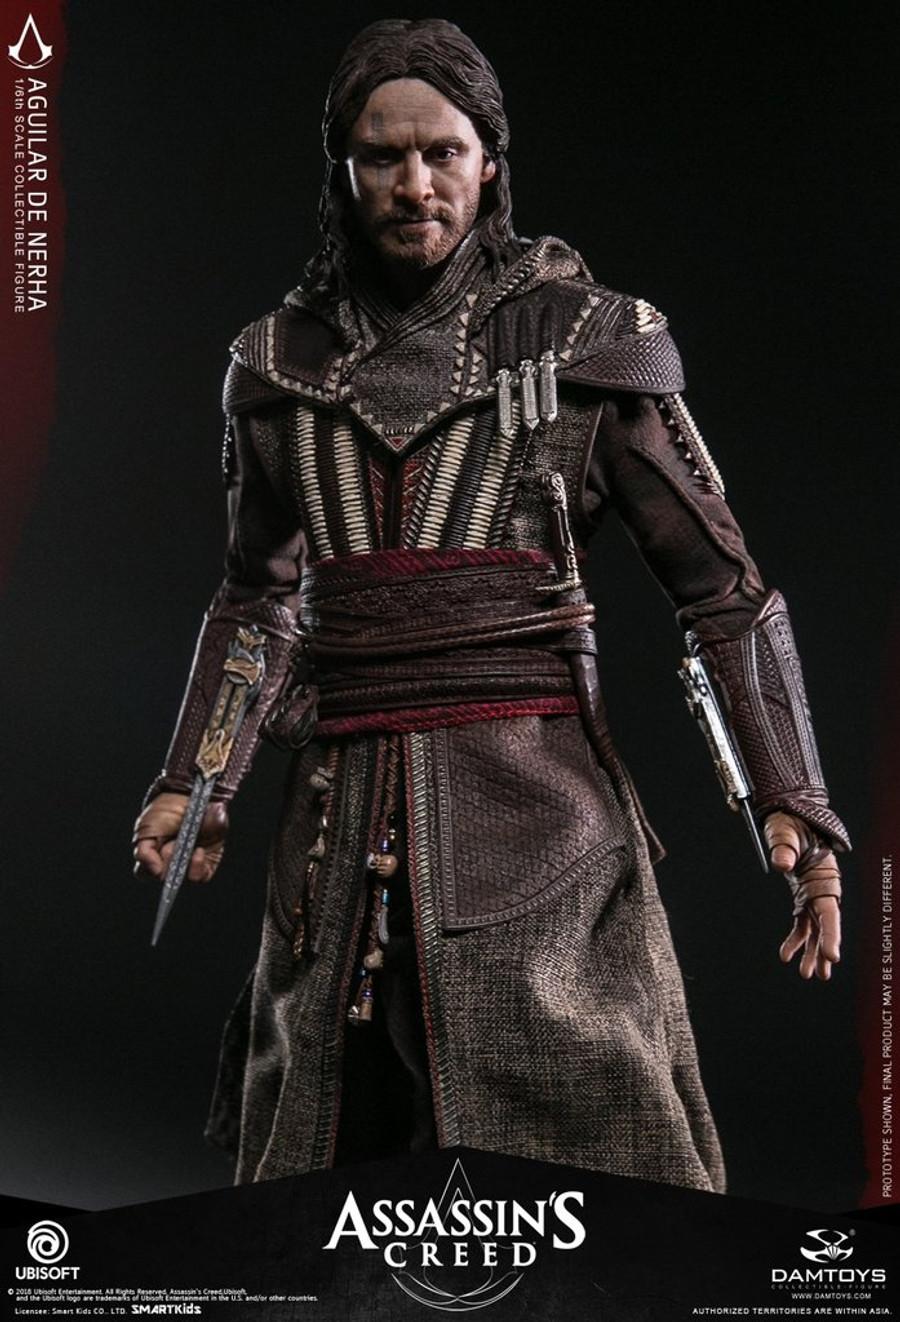 DAM Toys - Assassin's Creed: Aguilar De Nerha